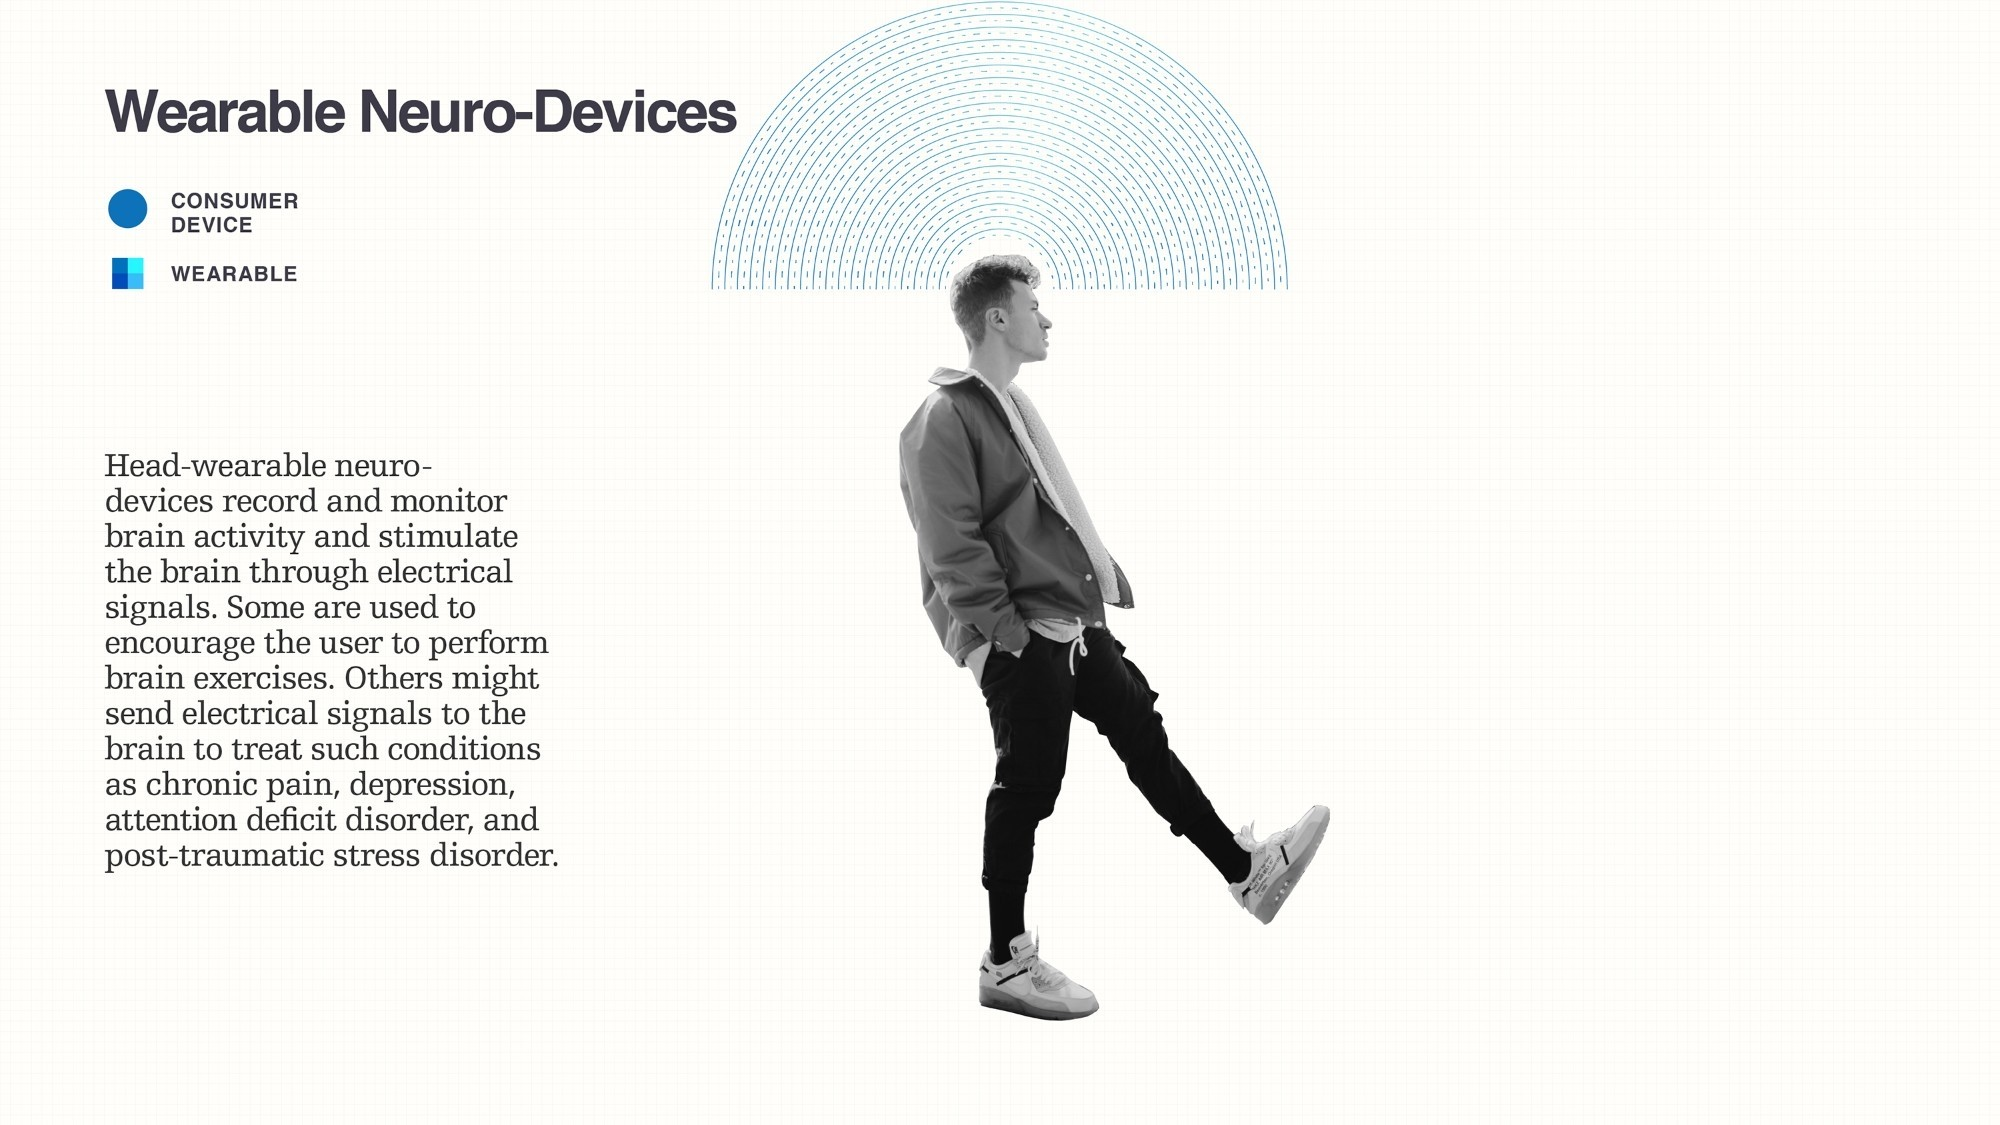 Data visualization illustrating wearable neuro-devices by Gioriga Lupi.